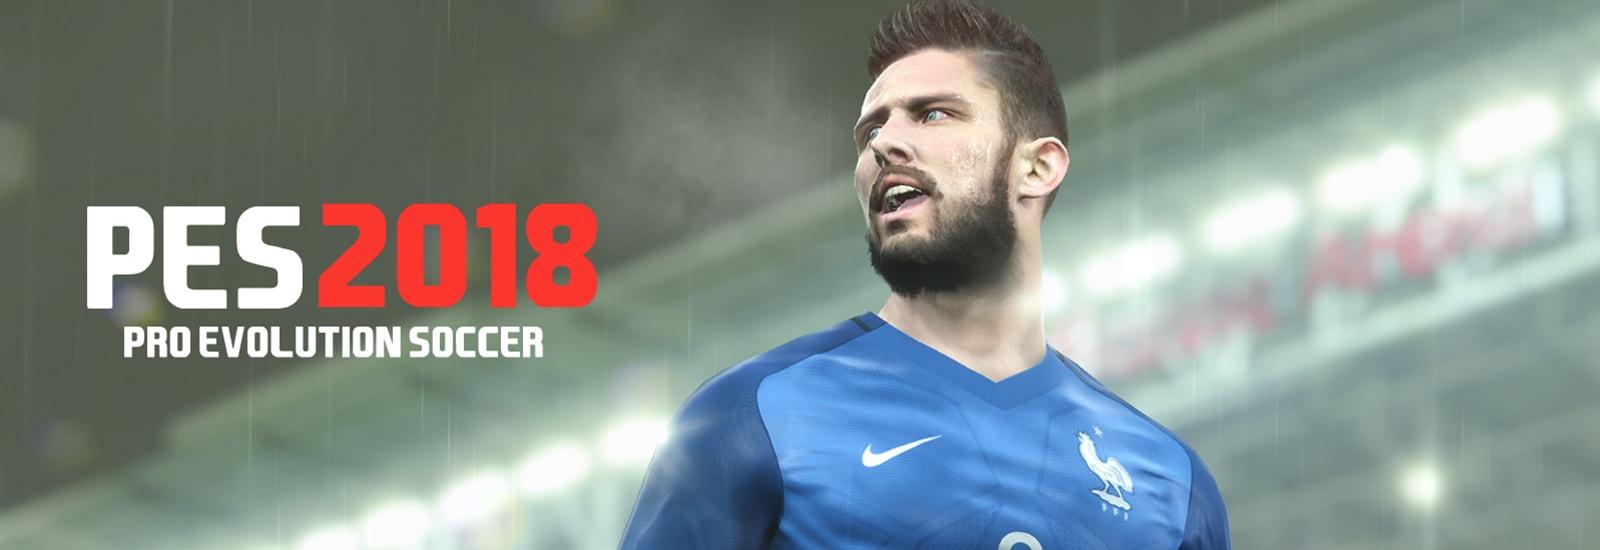 Pro Evolution Soccer 2018 Feature Image